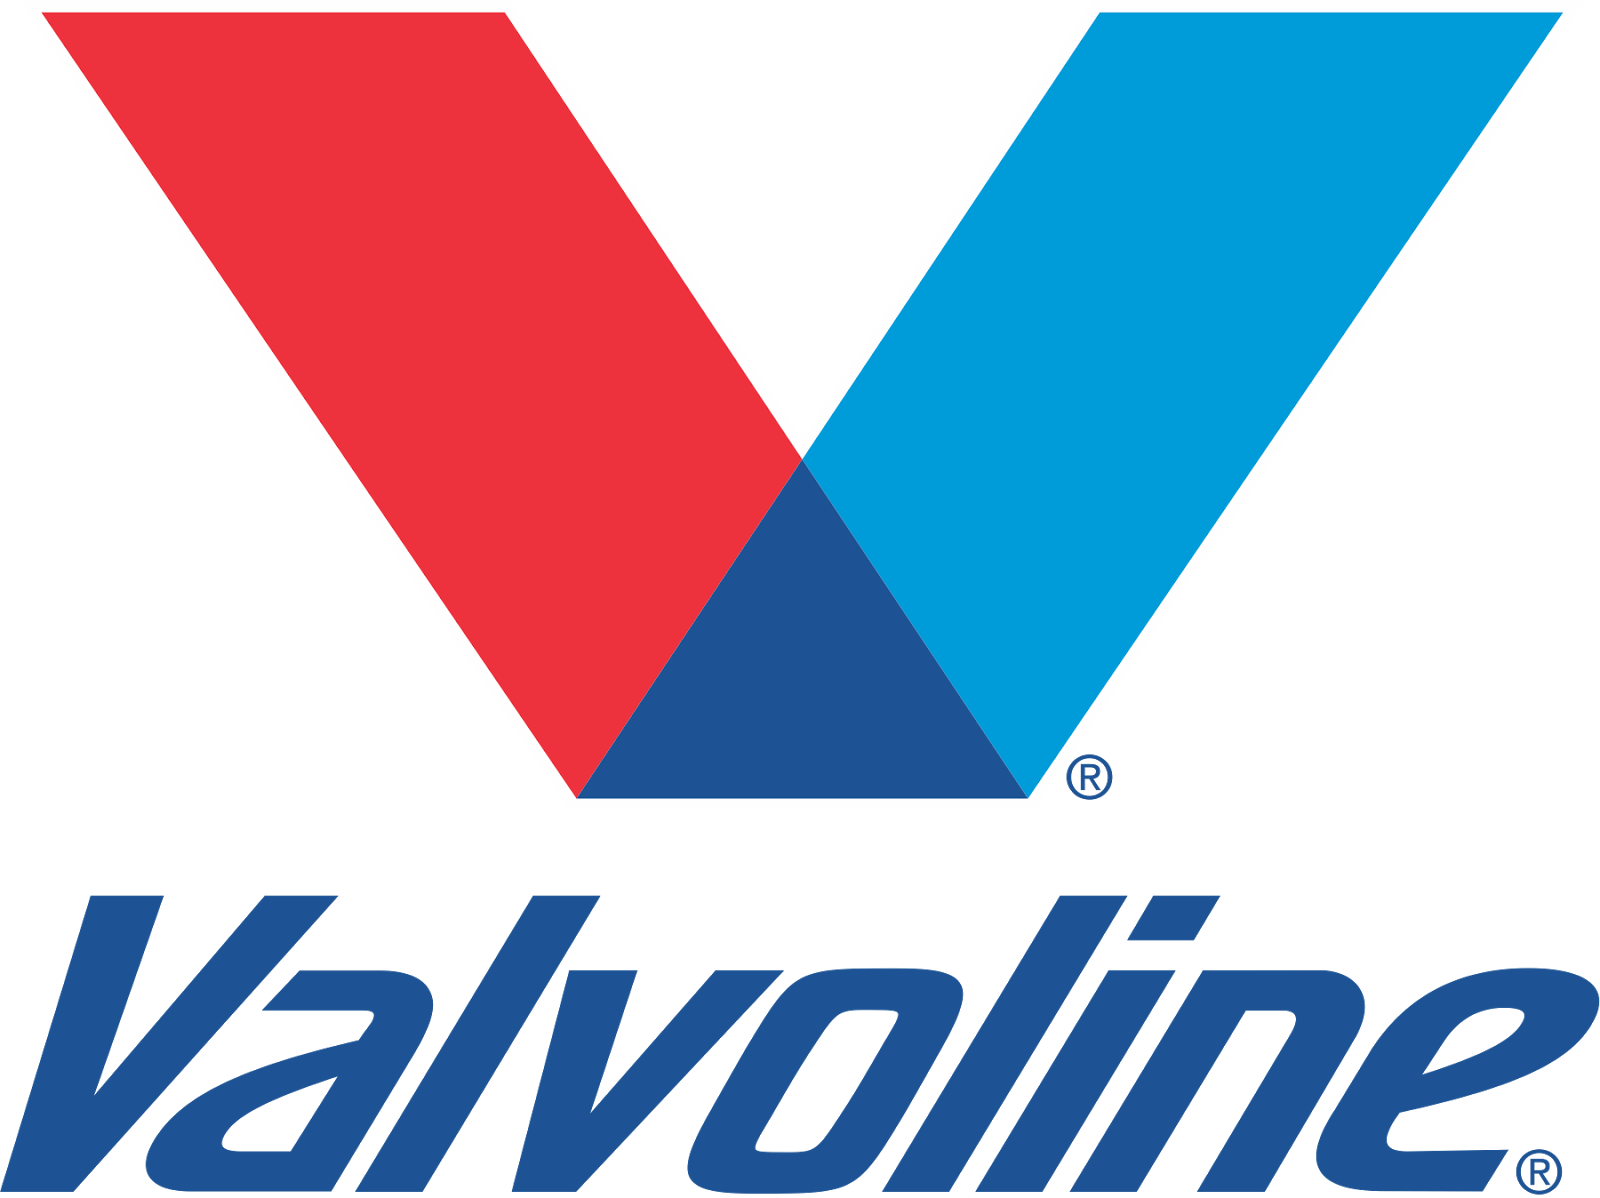 lubricant valvoline champ 4t enhance your bike performance chevrolet logo vectorizado chevrolet logo vector download